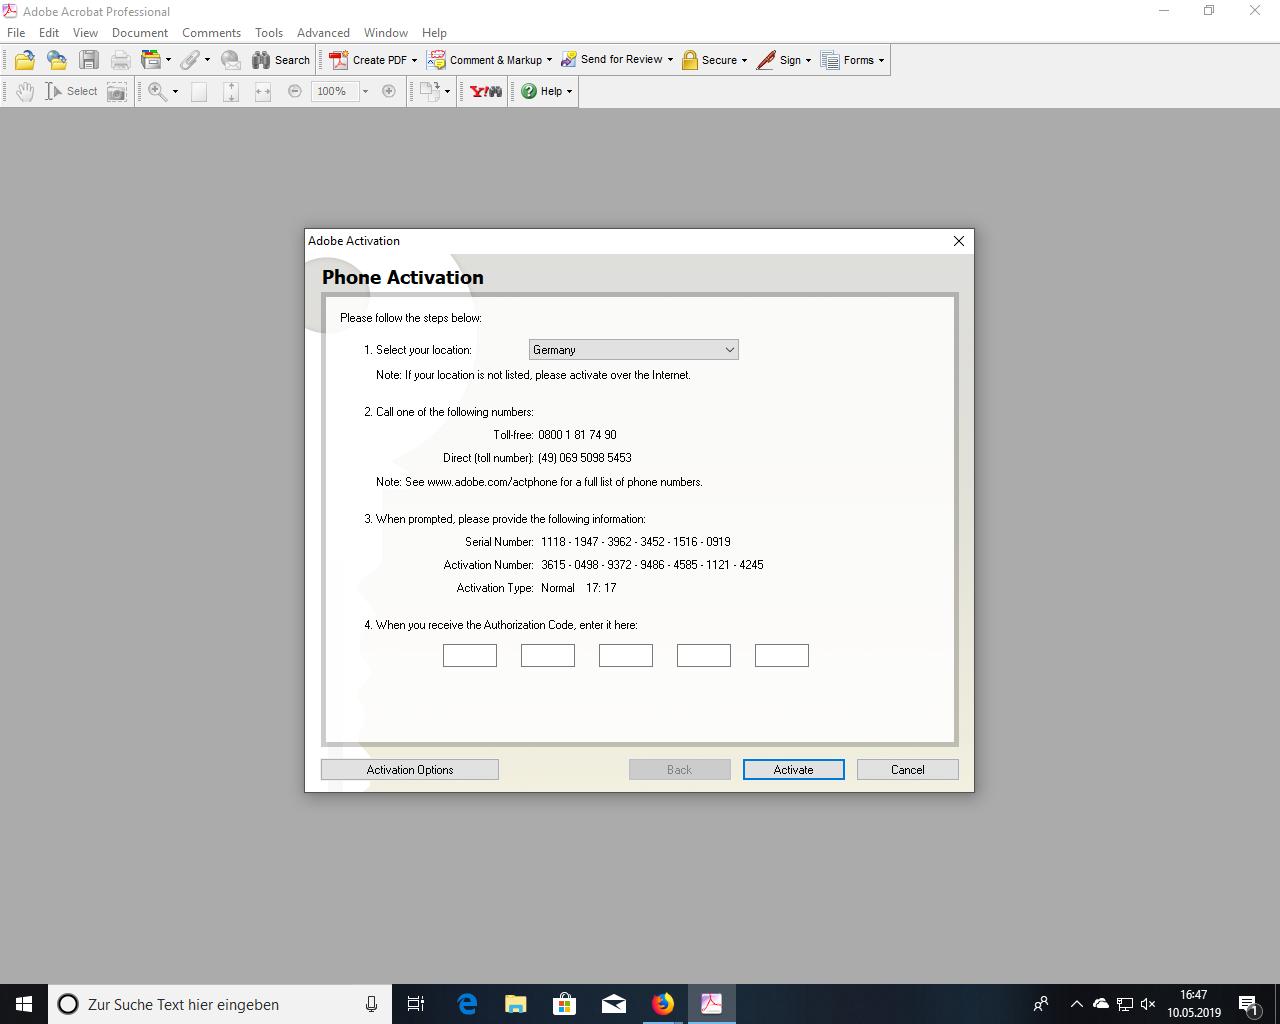 adobe acrobat 7.0 free download for windows 7